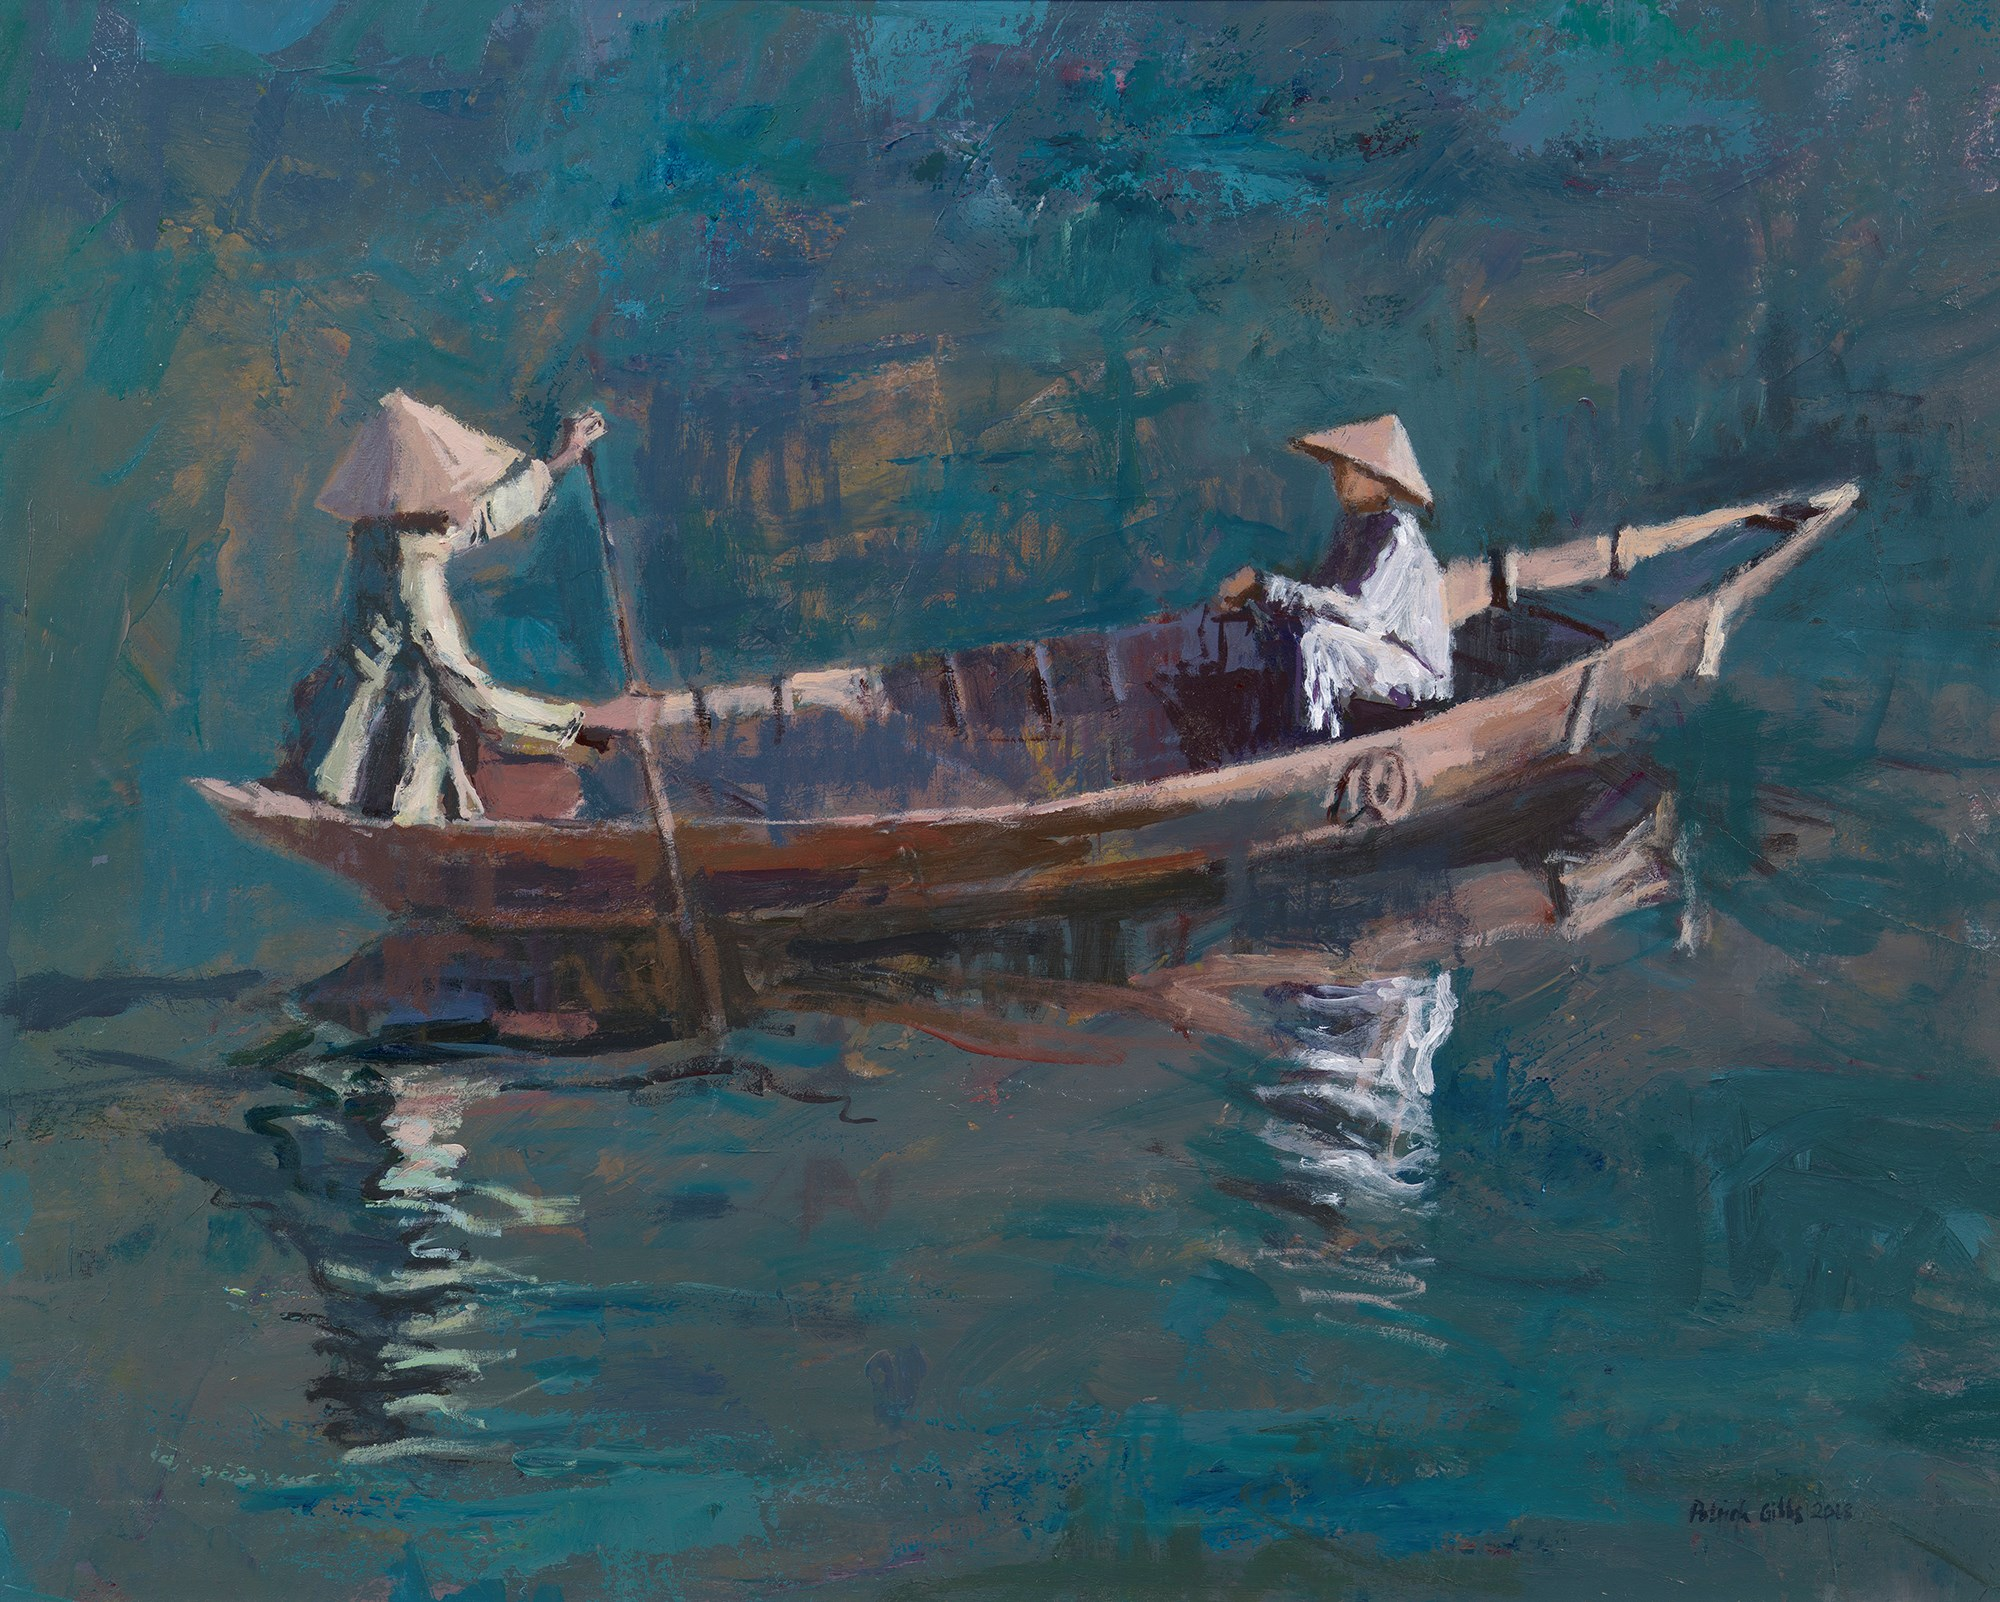 Two Women in a Boat, Hoi An, Vietnam - acrylic on board -  48 x 62 cms - POA